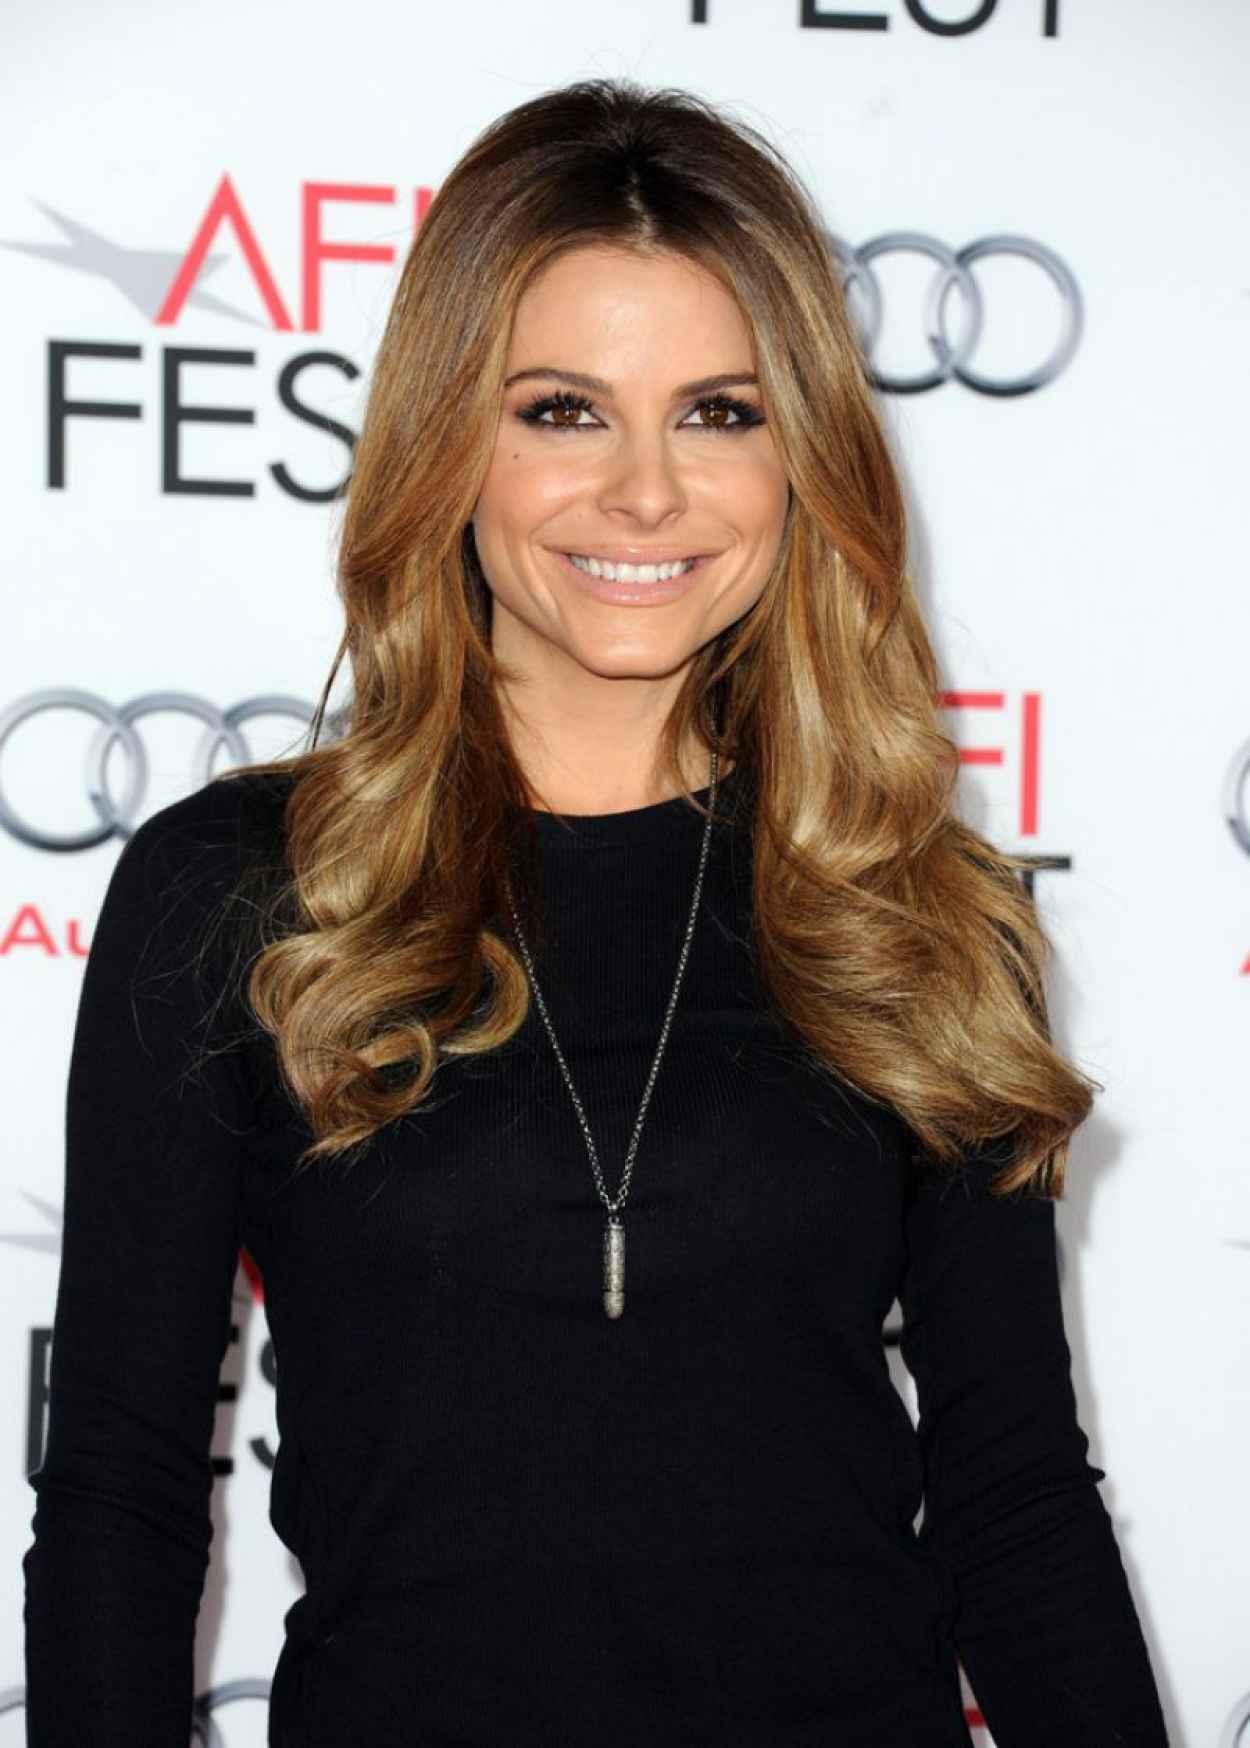 Maria Menounos on Red Carpet - LONE SURVIVOR Movie Premiere in Hollywood-1